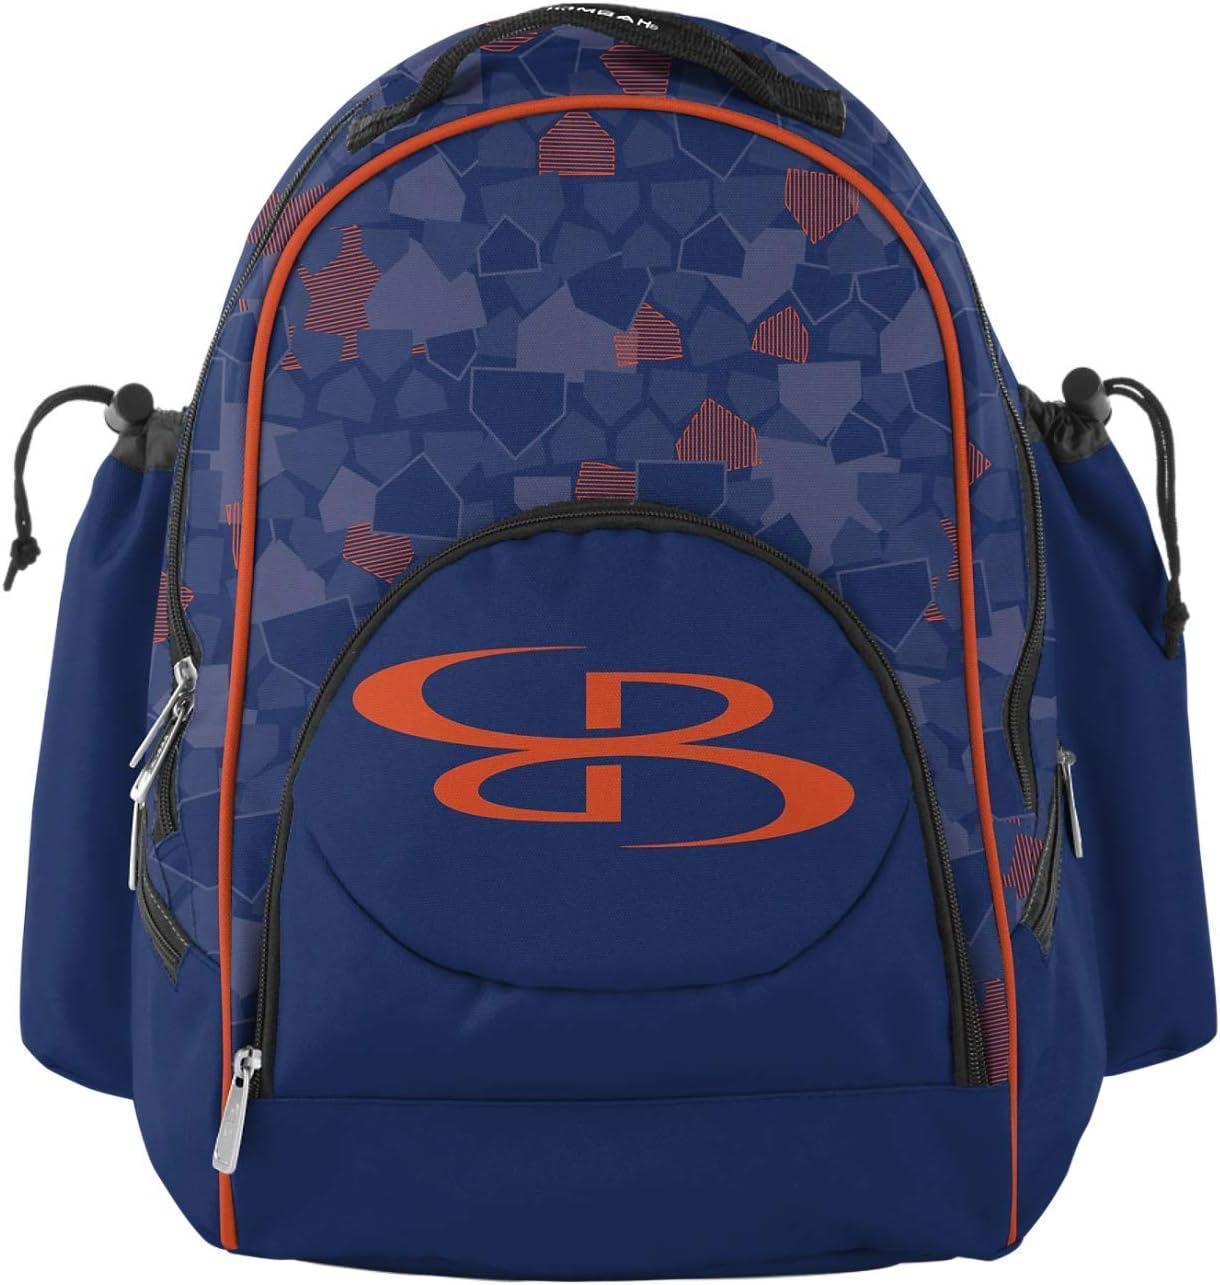 Boombah 人気の製品 25%OFF Tyro Baseball Softball Bat Backpack 10